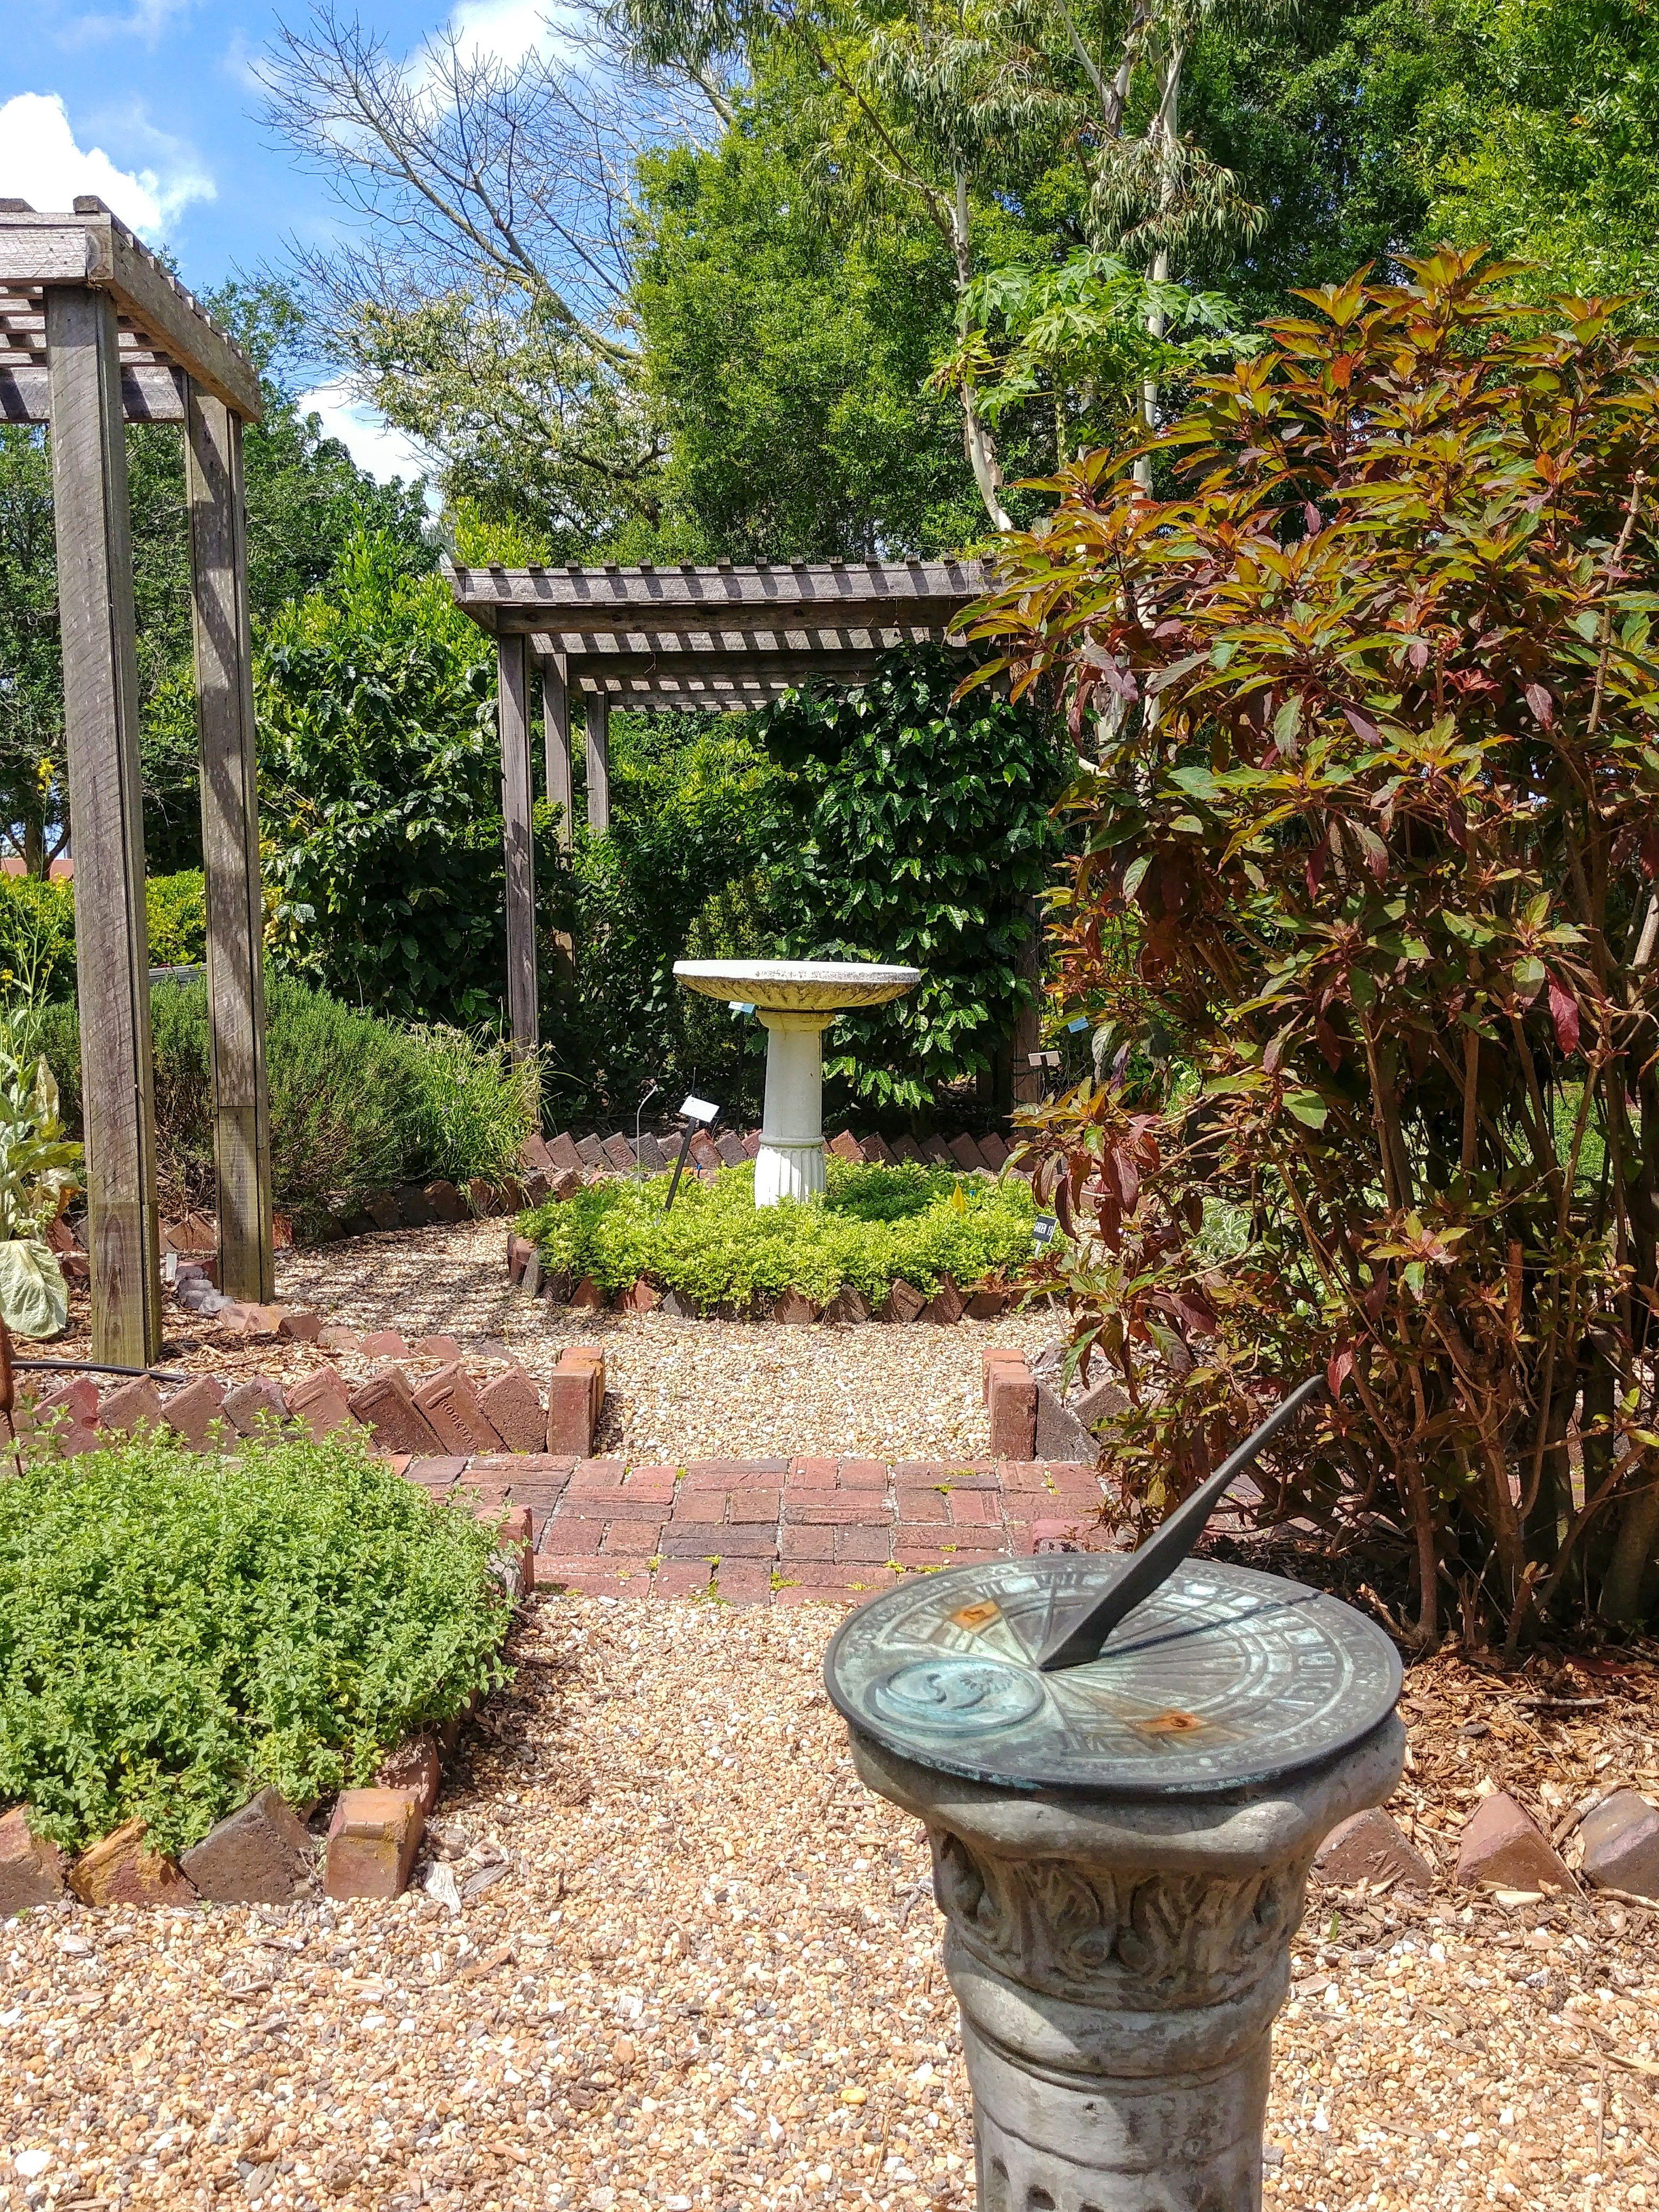 997ab142b631b3ecec3632ee63cb385e - The Florida Botanical Gardens In Largo